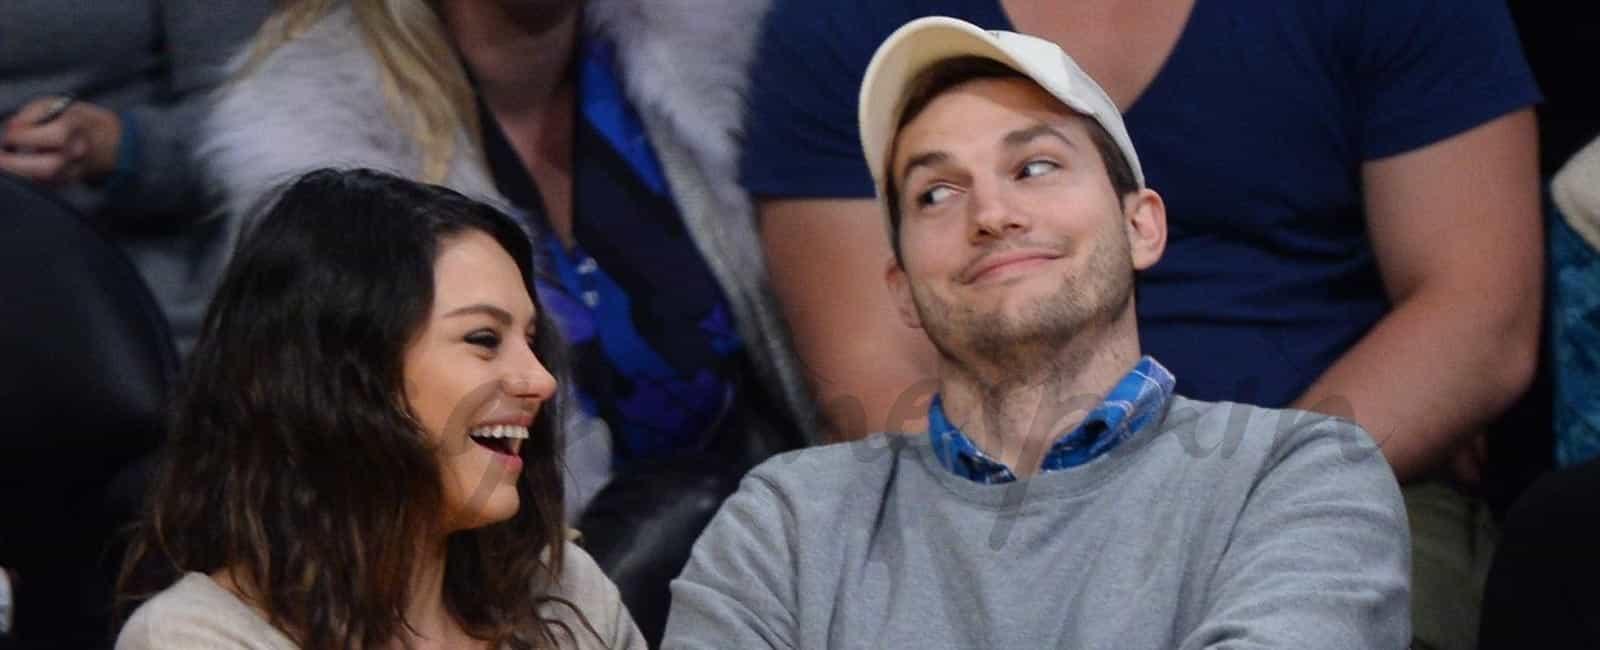 Mila Kunis y Ashton Kutcher, nace su segundo hijo